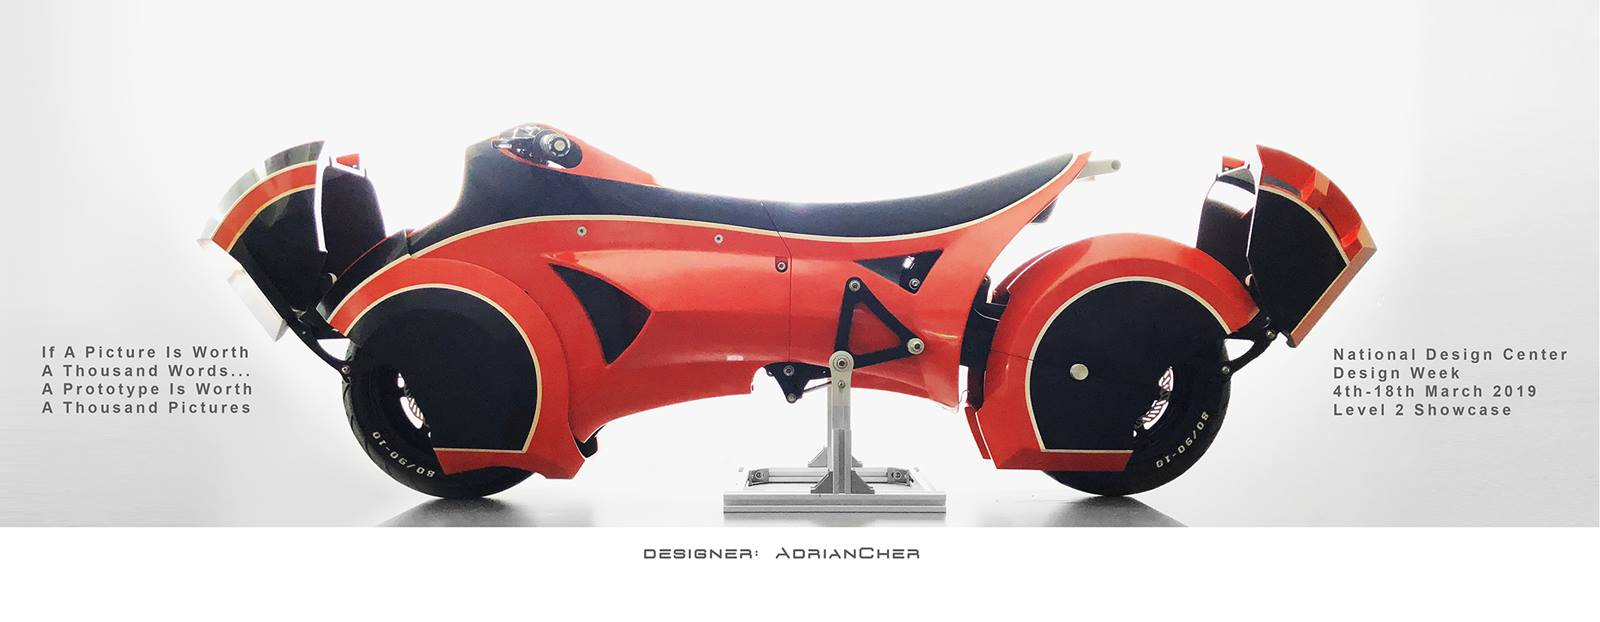 Ultrabike Prototype for Akira bike and Tron Machine Lovers!